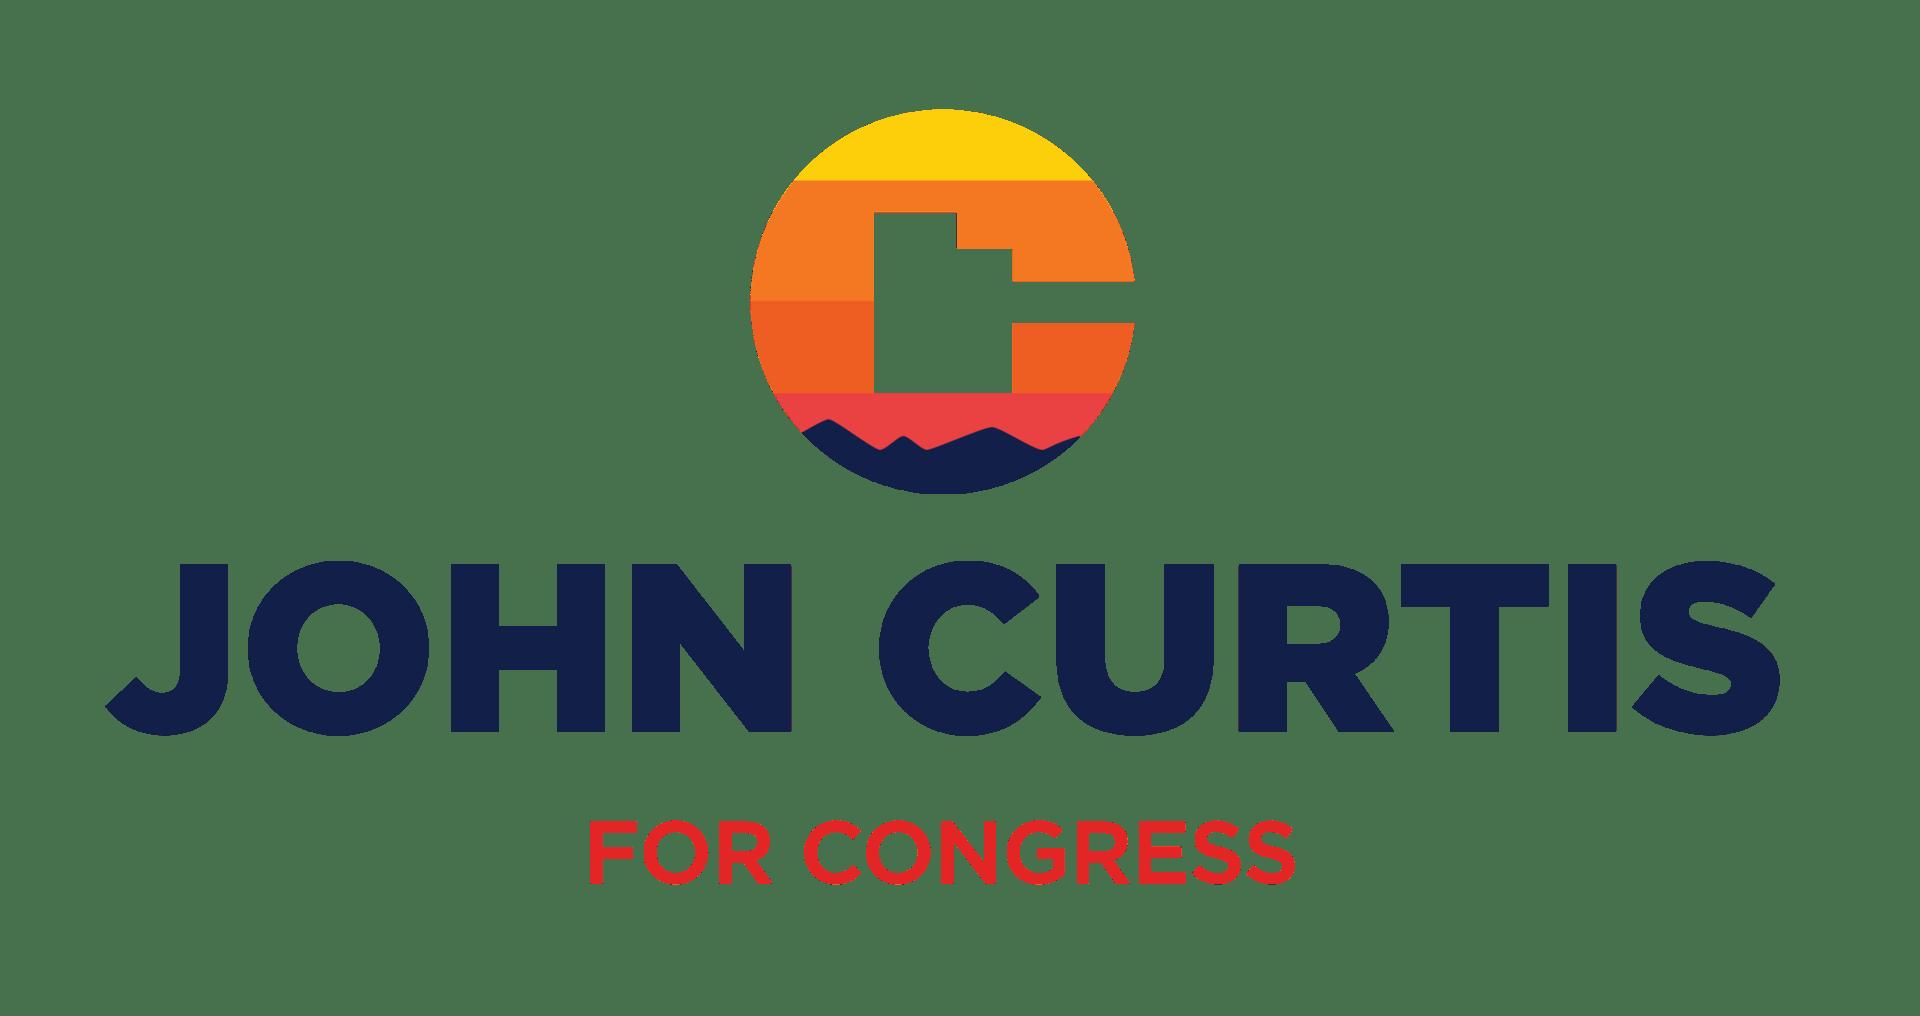 Curtis vector logos stacked